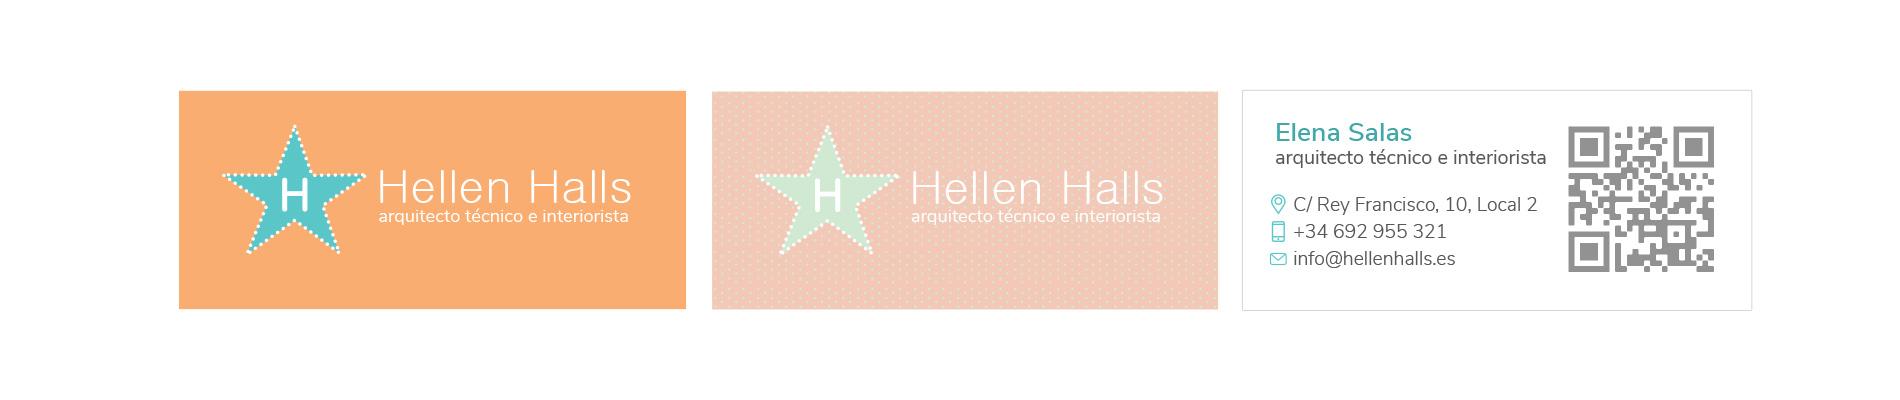 Tarjetas Visita Hellen Halls